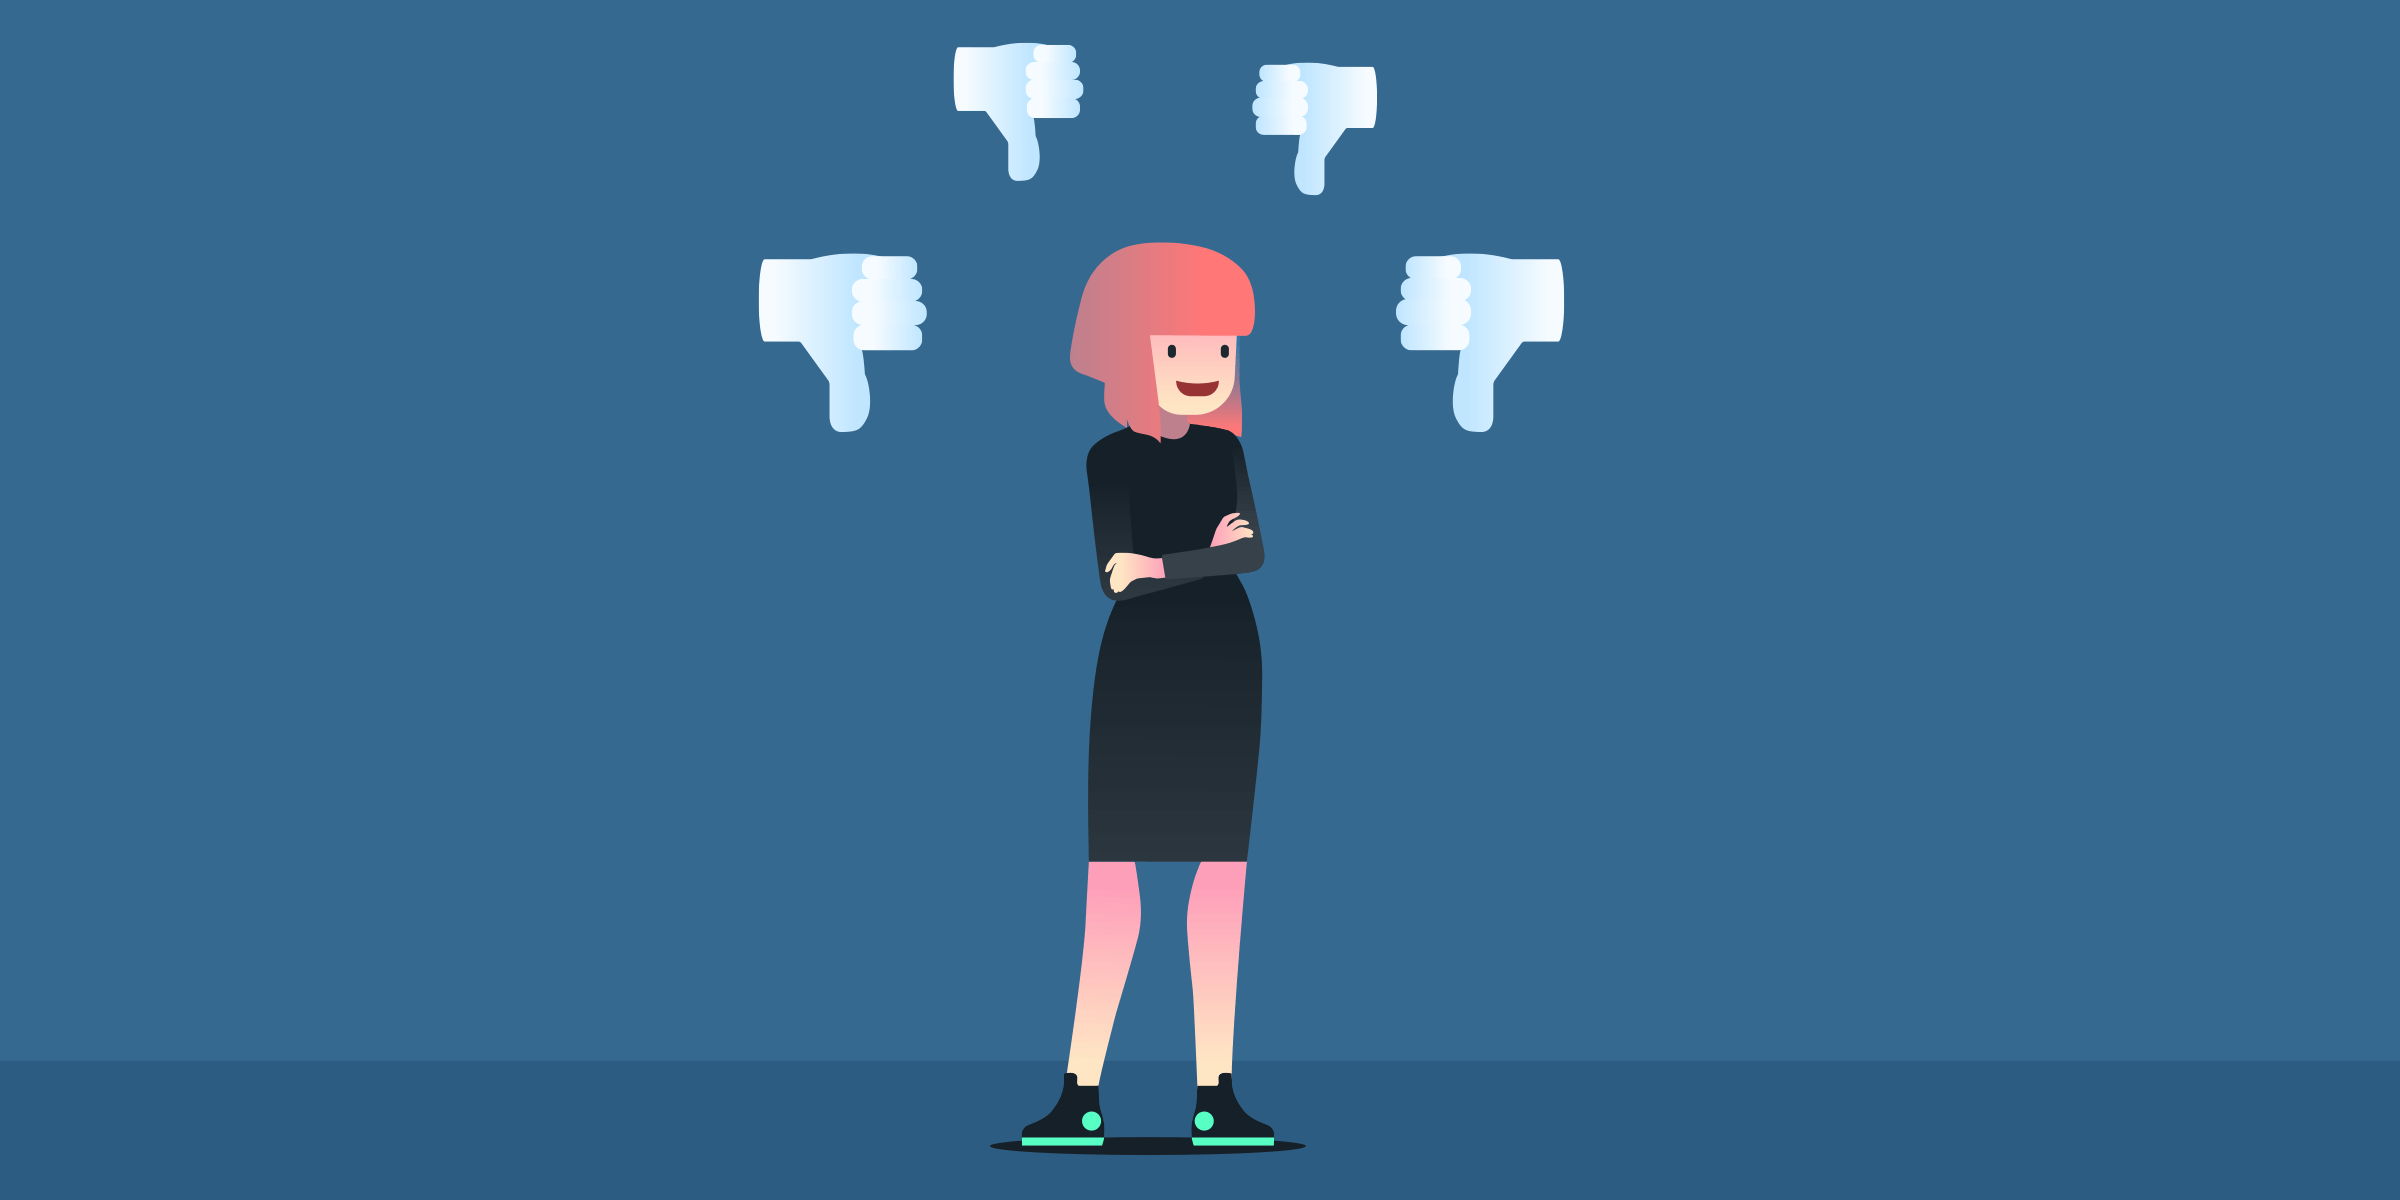 Negative feedback hurts chances of reaching a goal